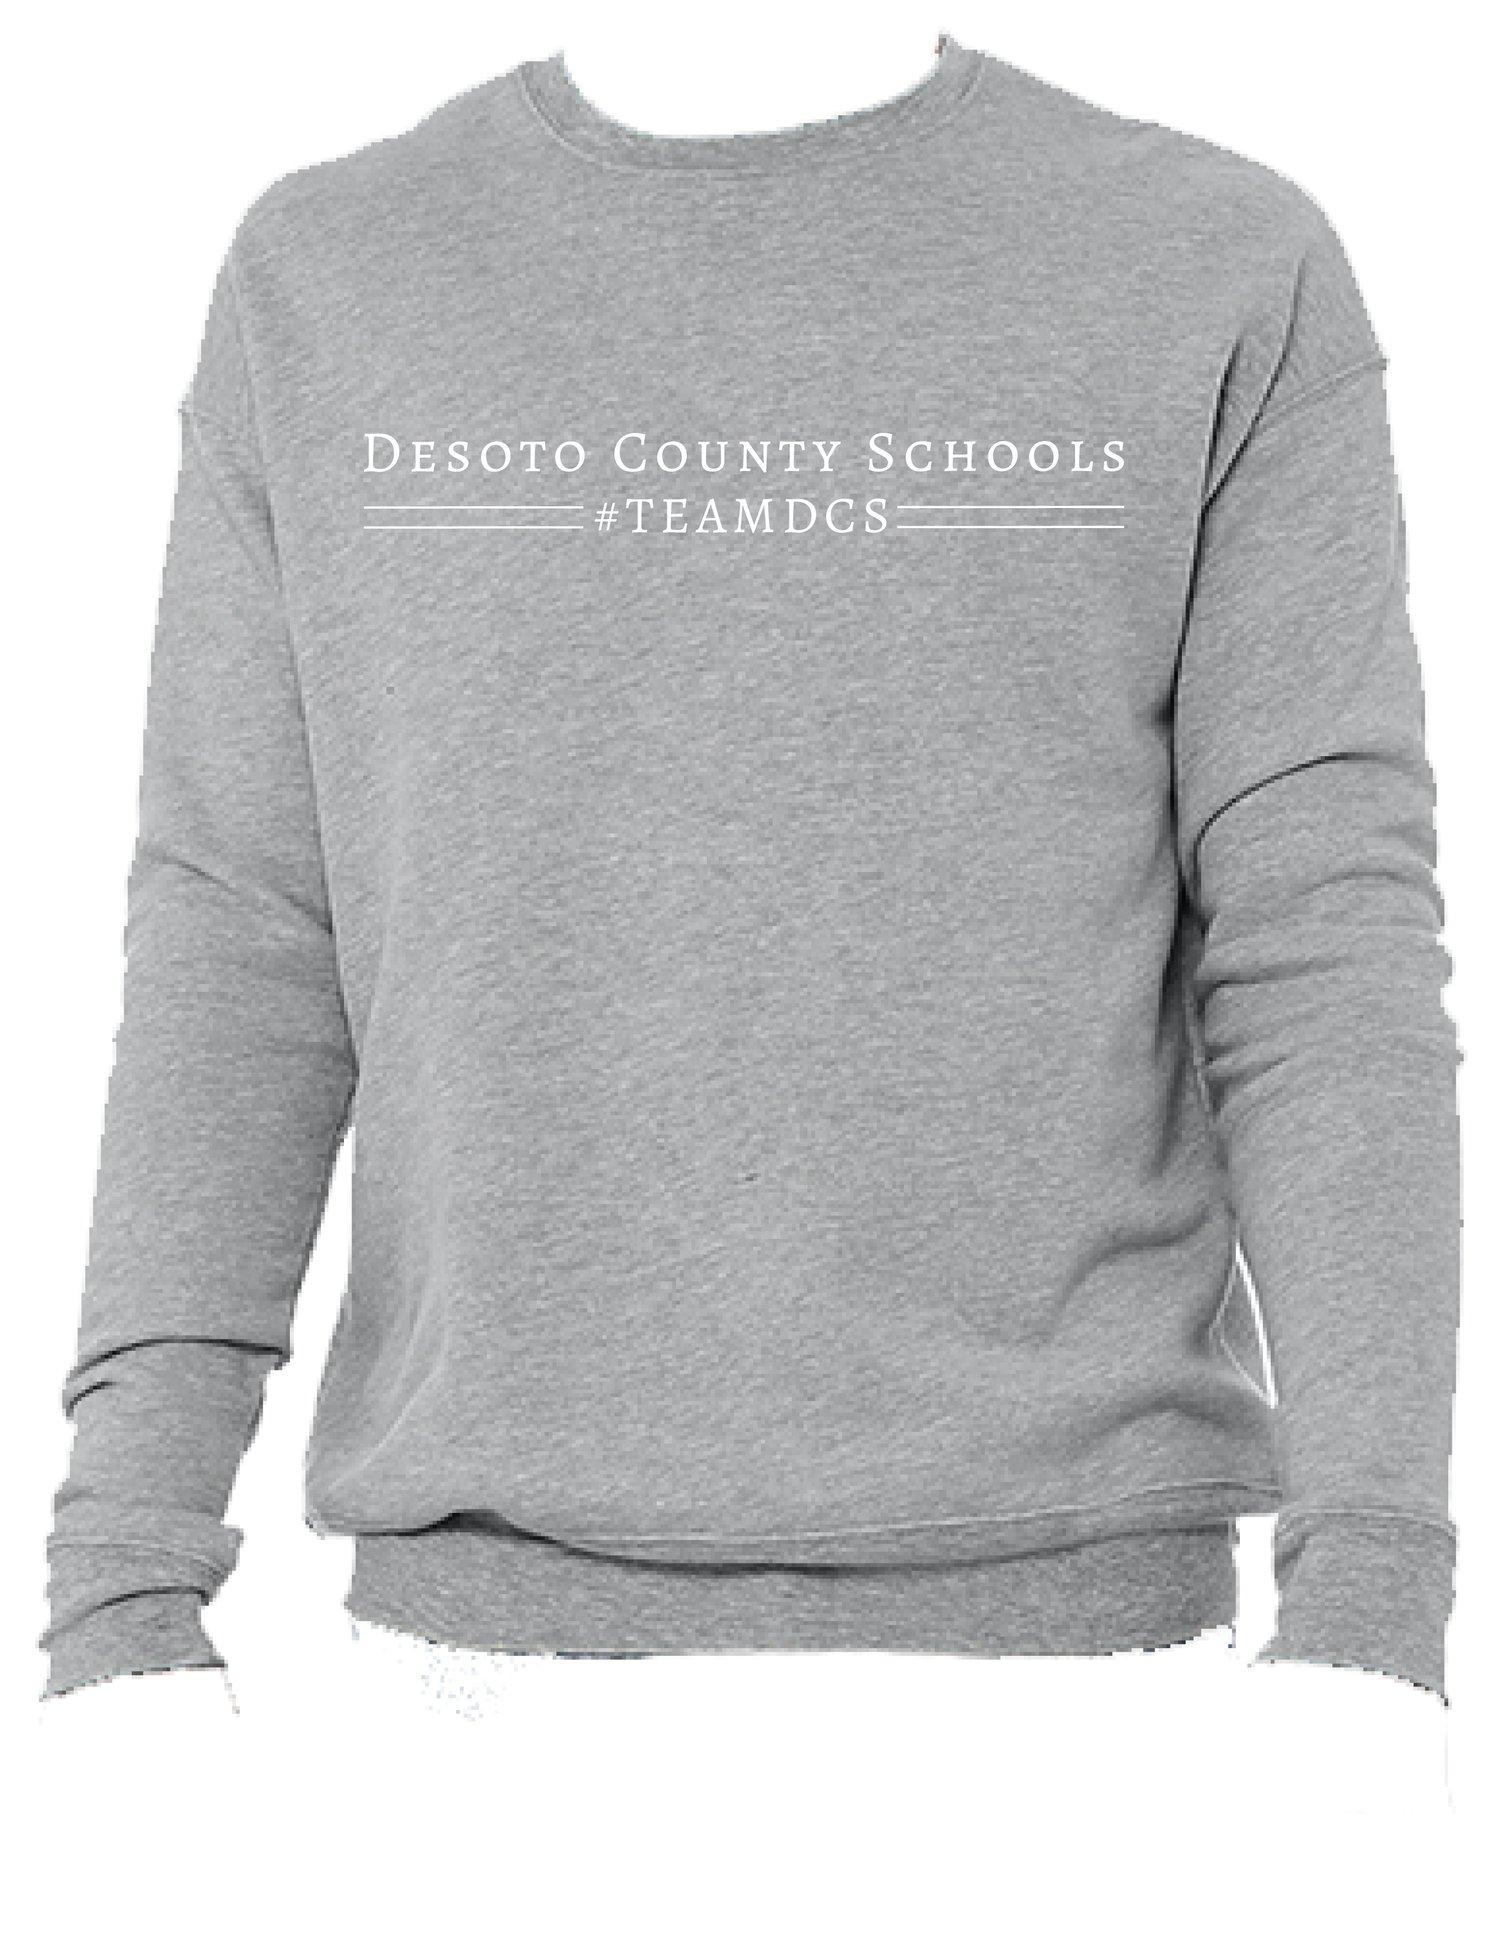 Image of Desoto County Schools #TEAMDCS Sweatshirt- Sport Grey